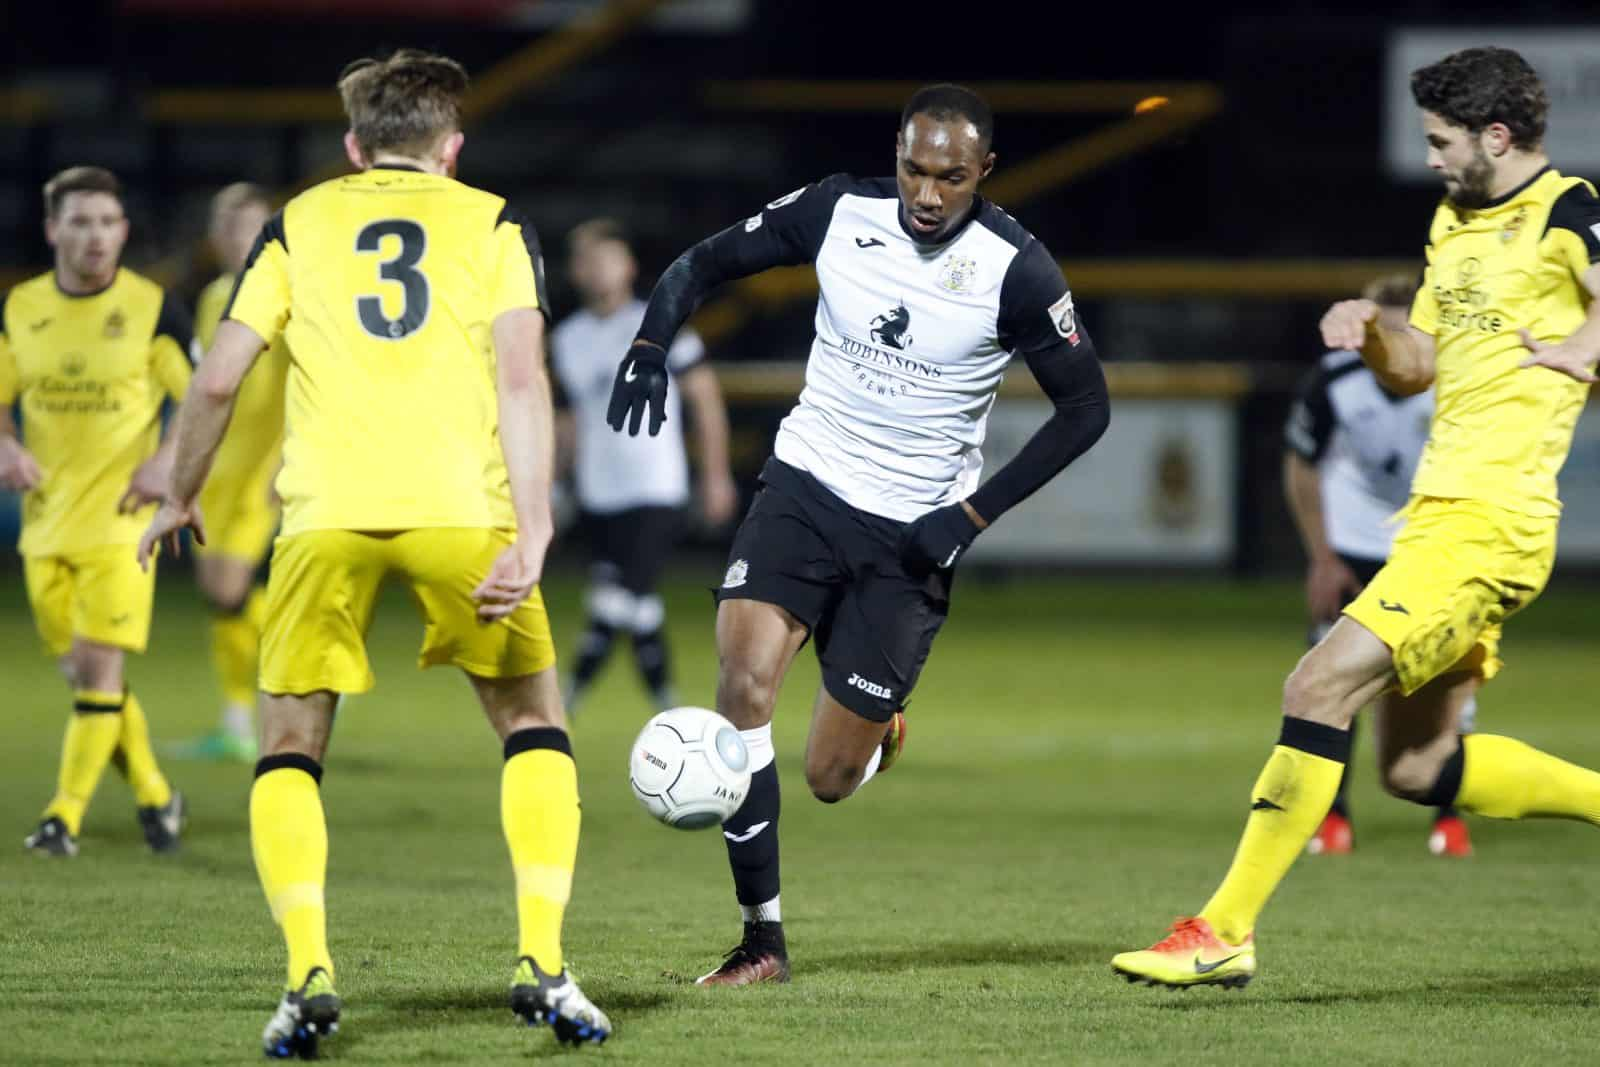 Bohan Dixon, Southport FC 0-3 Stockport County, 29.11.17